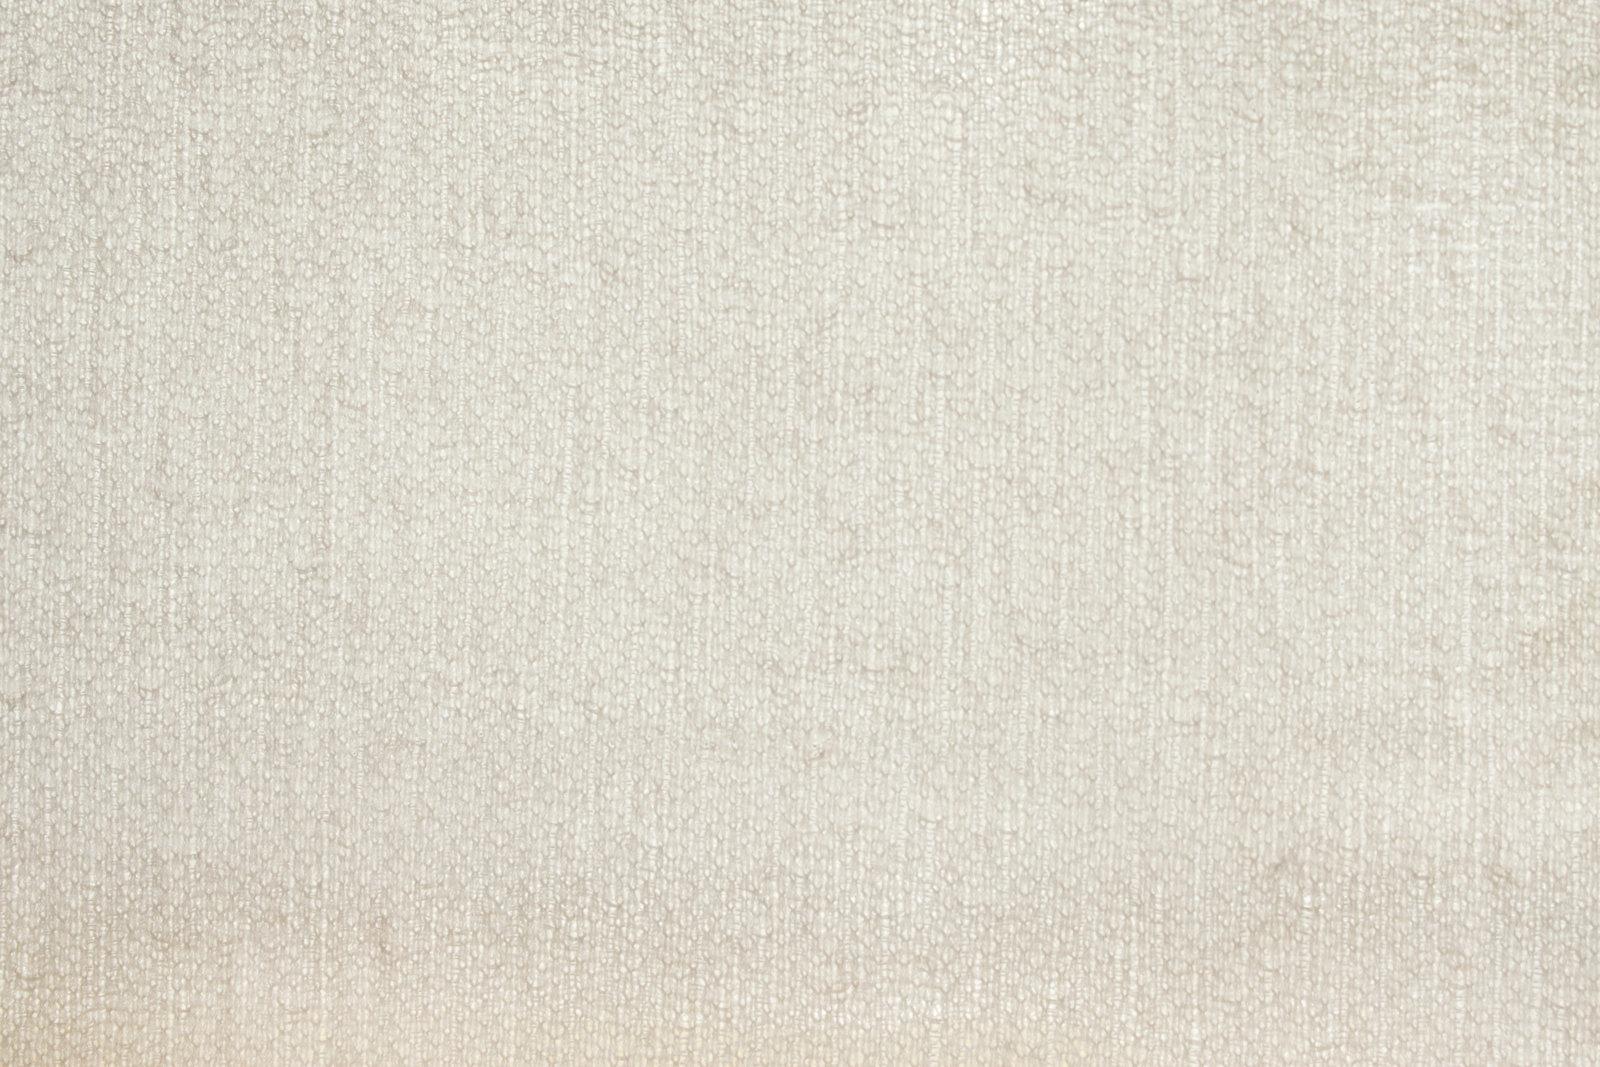 Soft Fabrics Textures